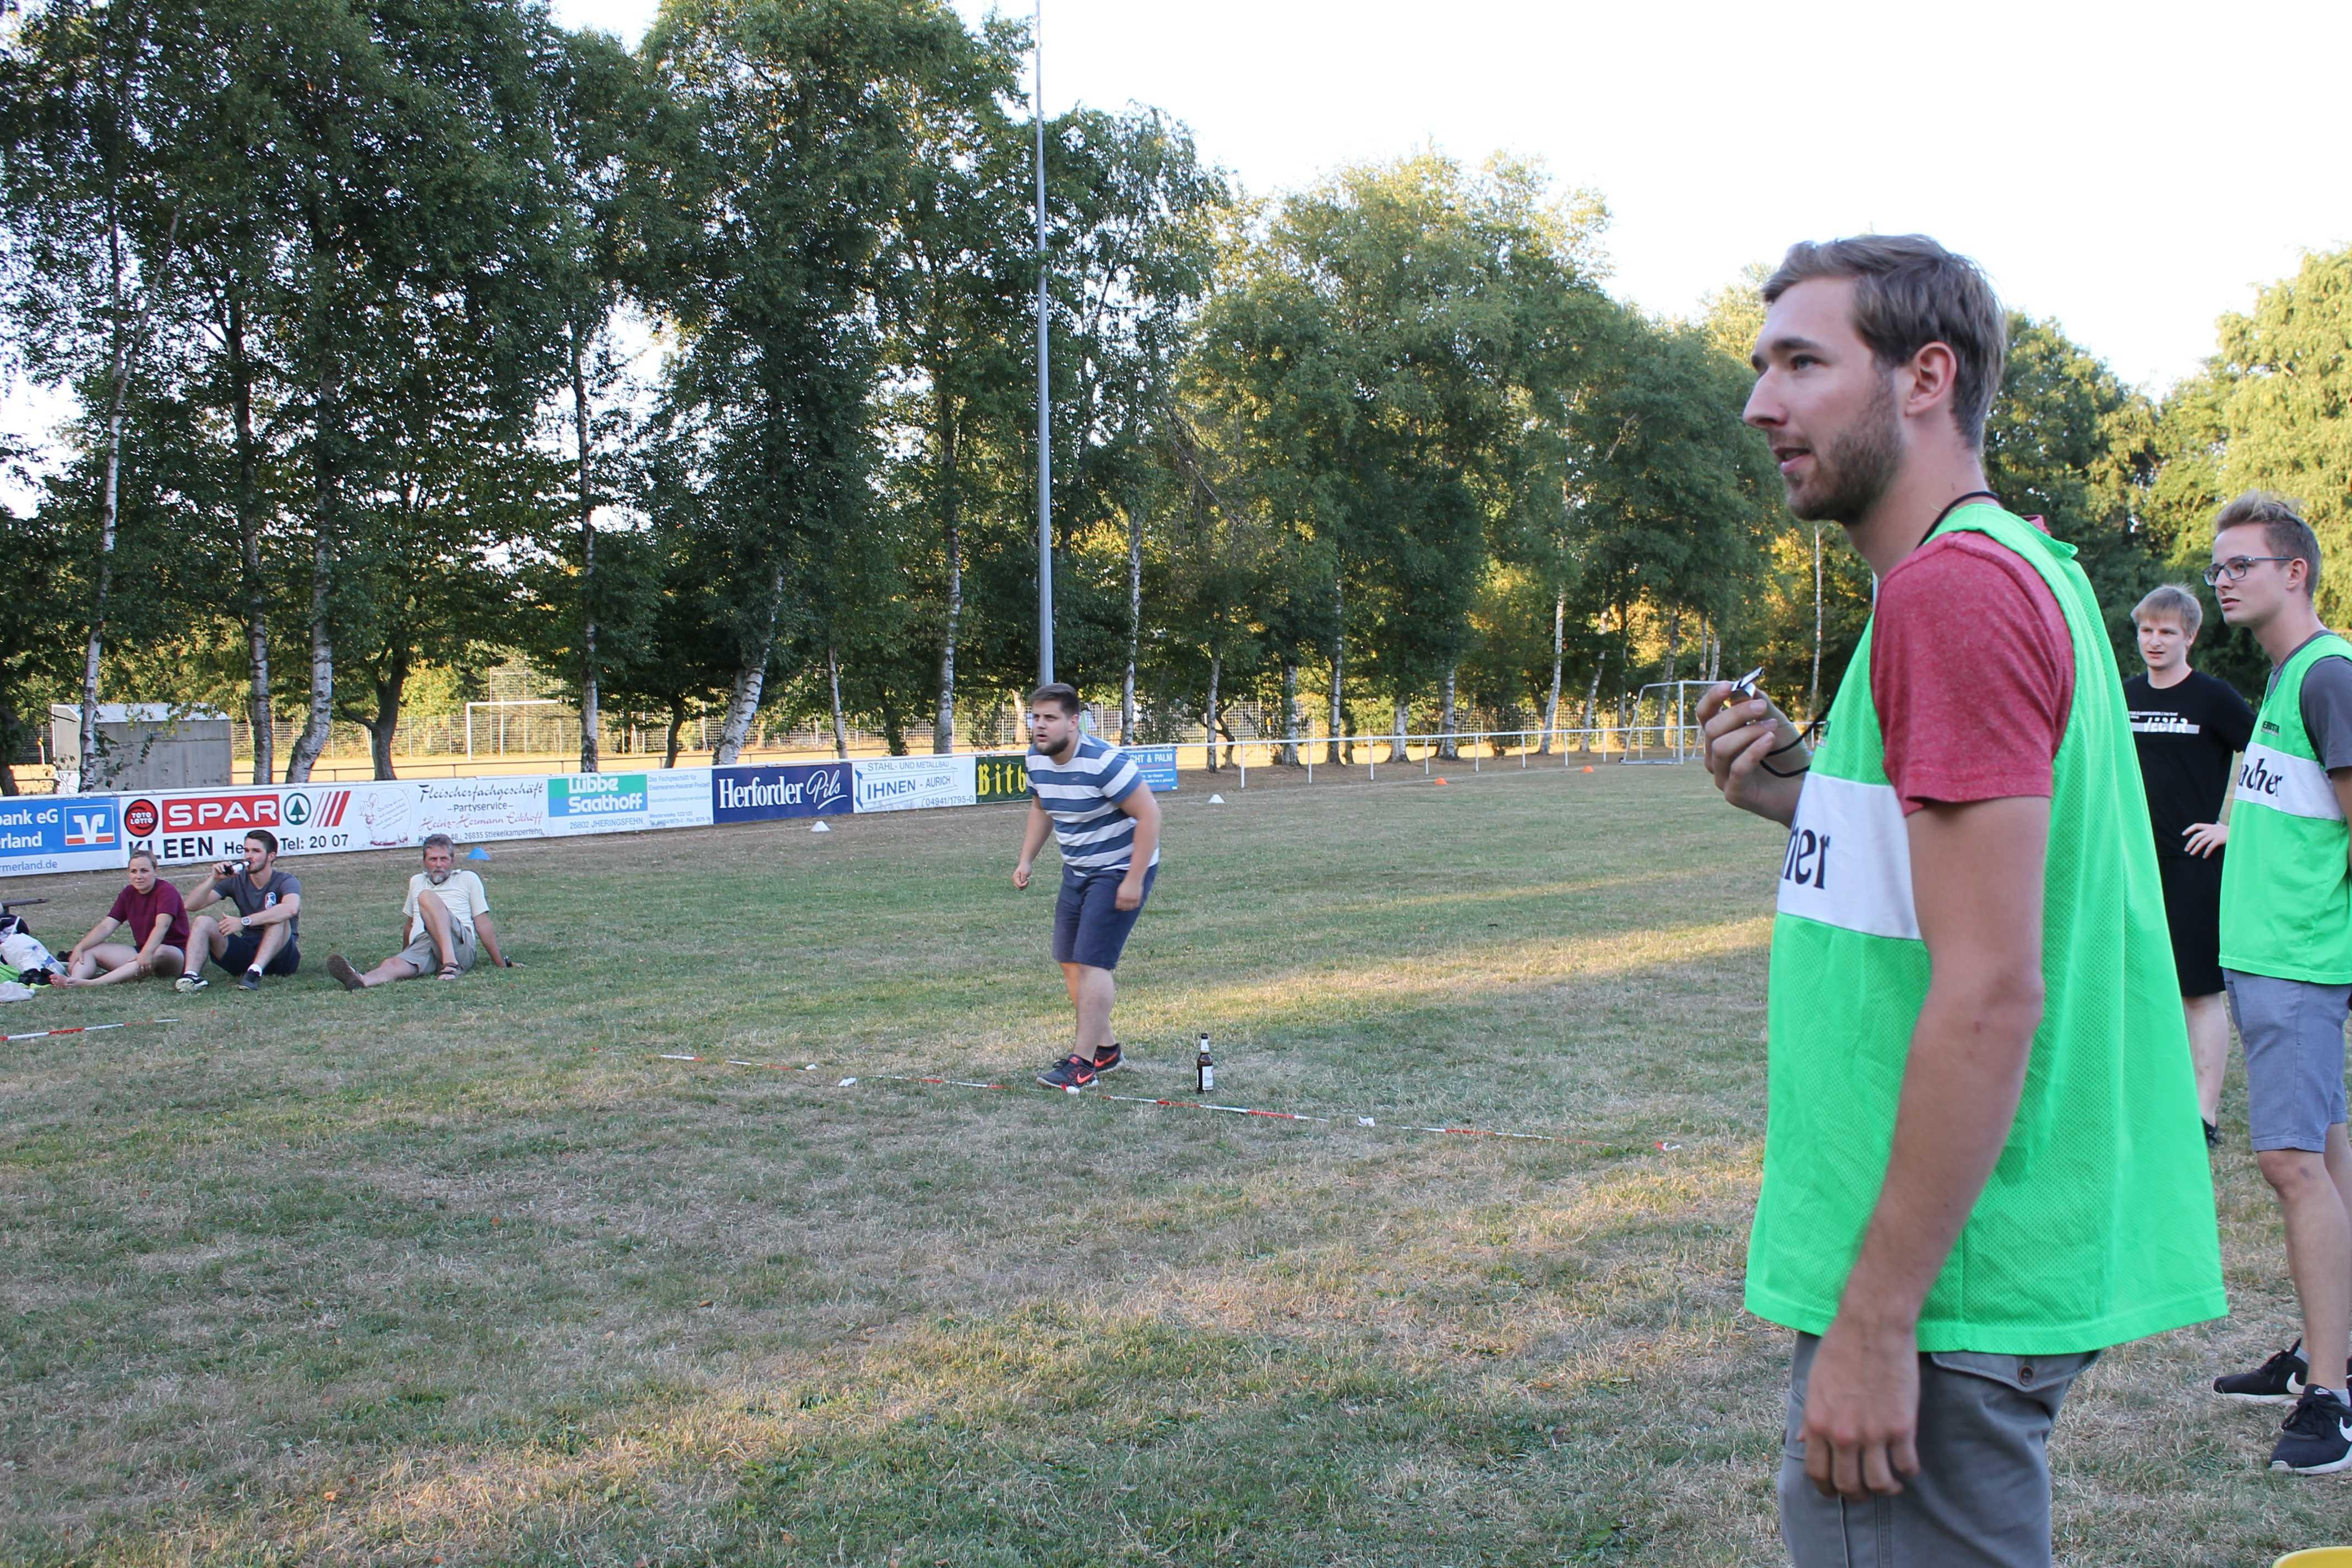 2018-07-27 Sportwoche - Flunkyball Turnier (52)